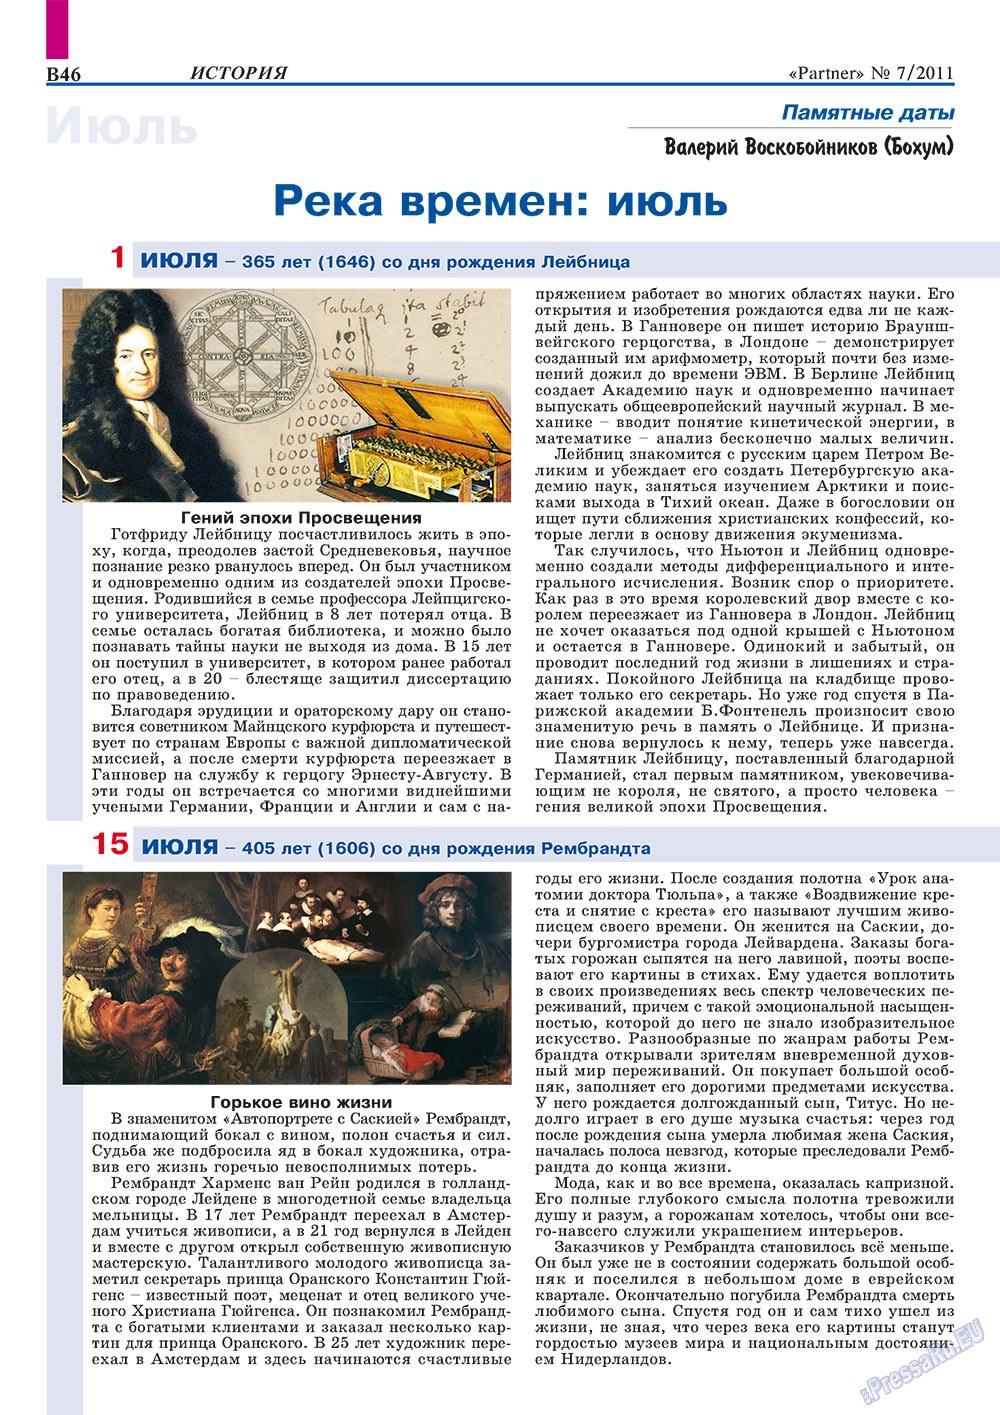 Партнер-север (журнал). 2011 год, номер 7, стр. 56